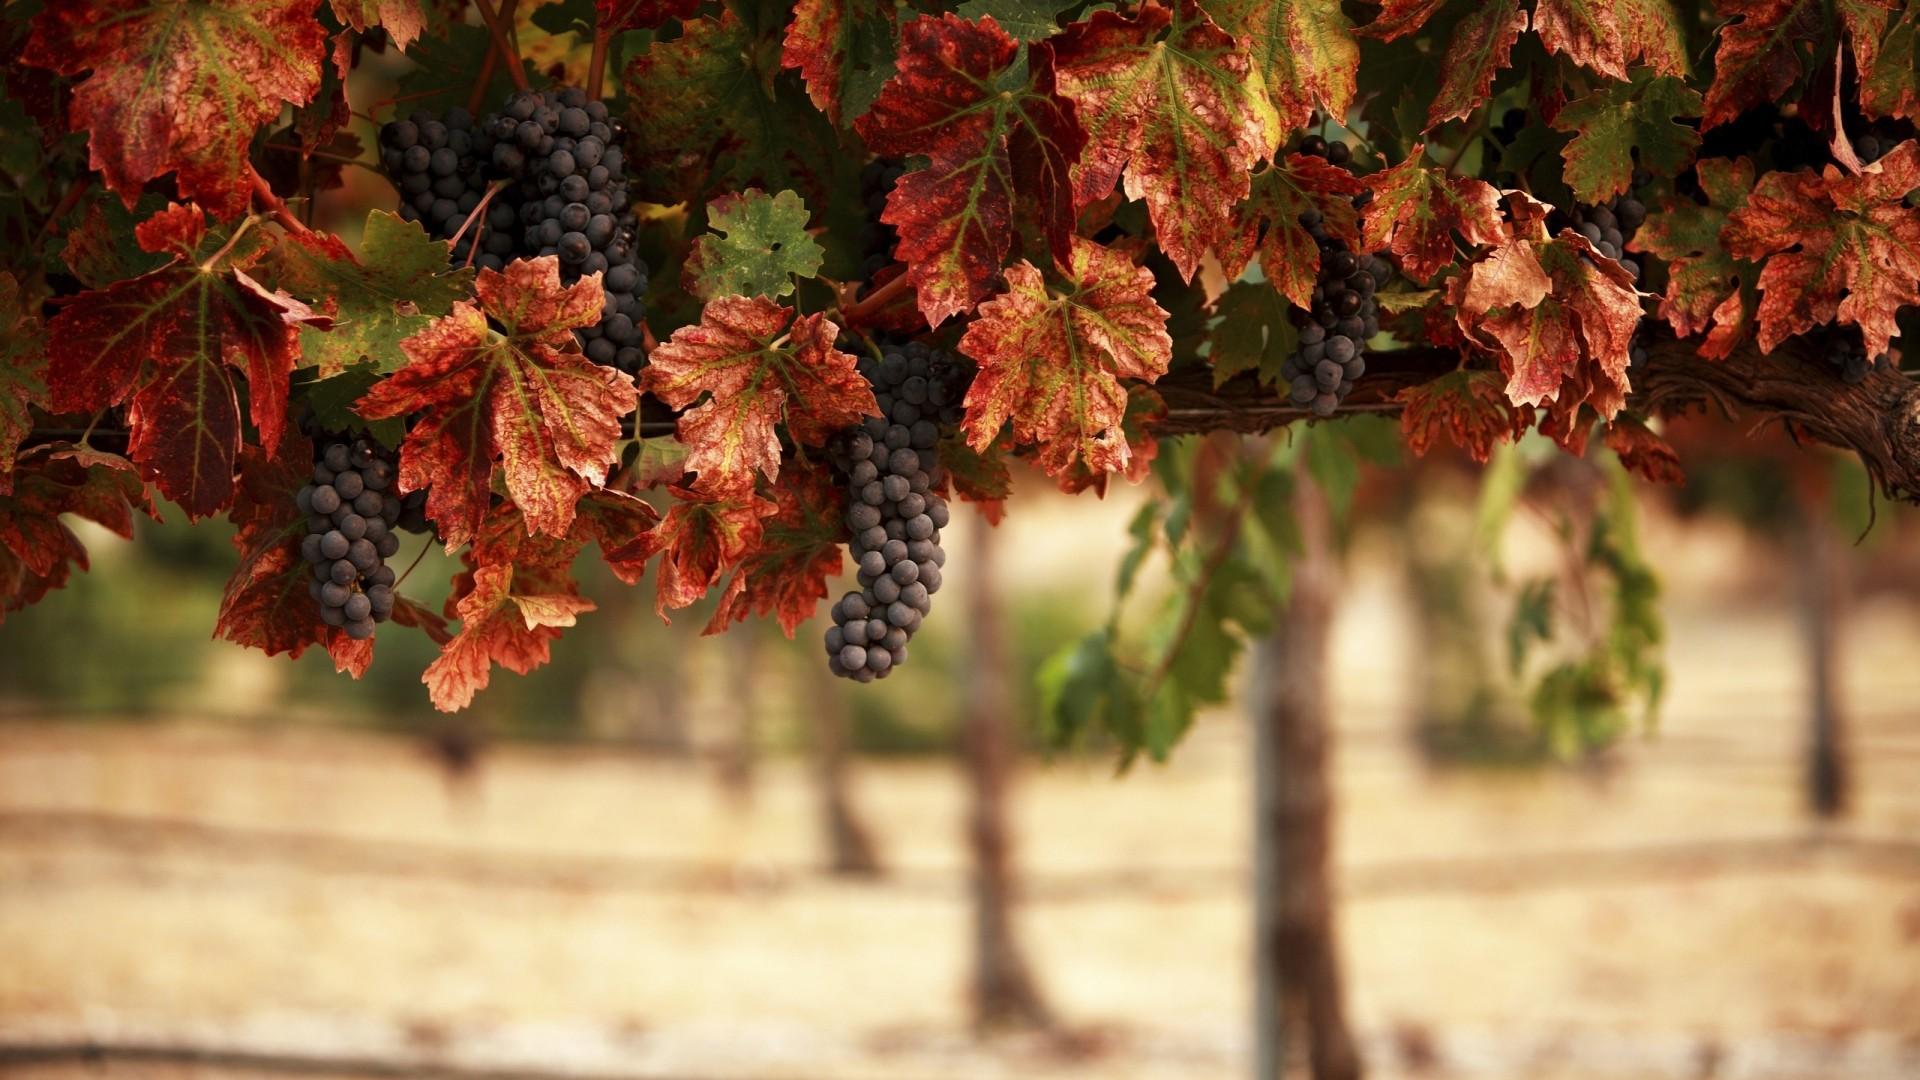 … Background Full HD 1080p. Wallpaper nature, leaves, blur,  vineyard, grapes, landscape